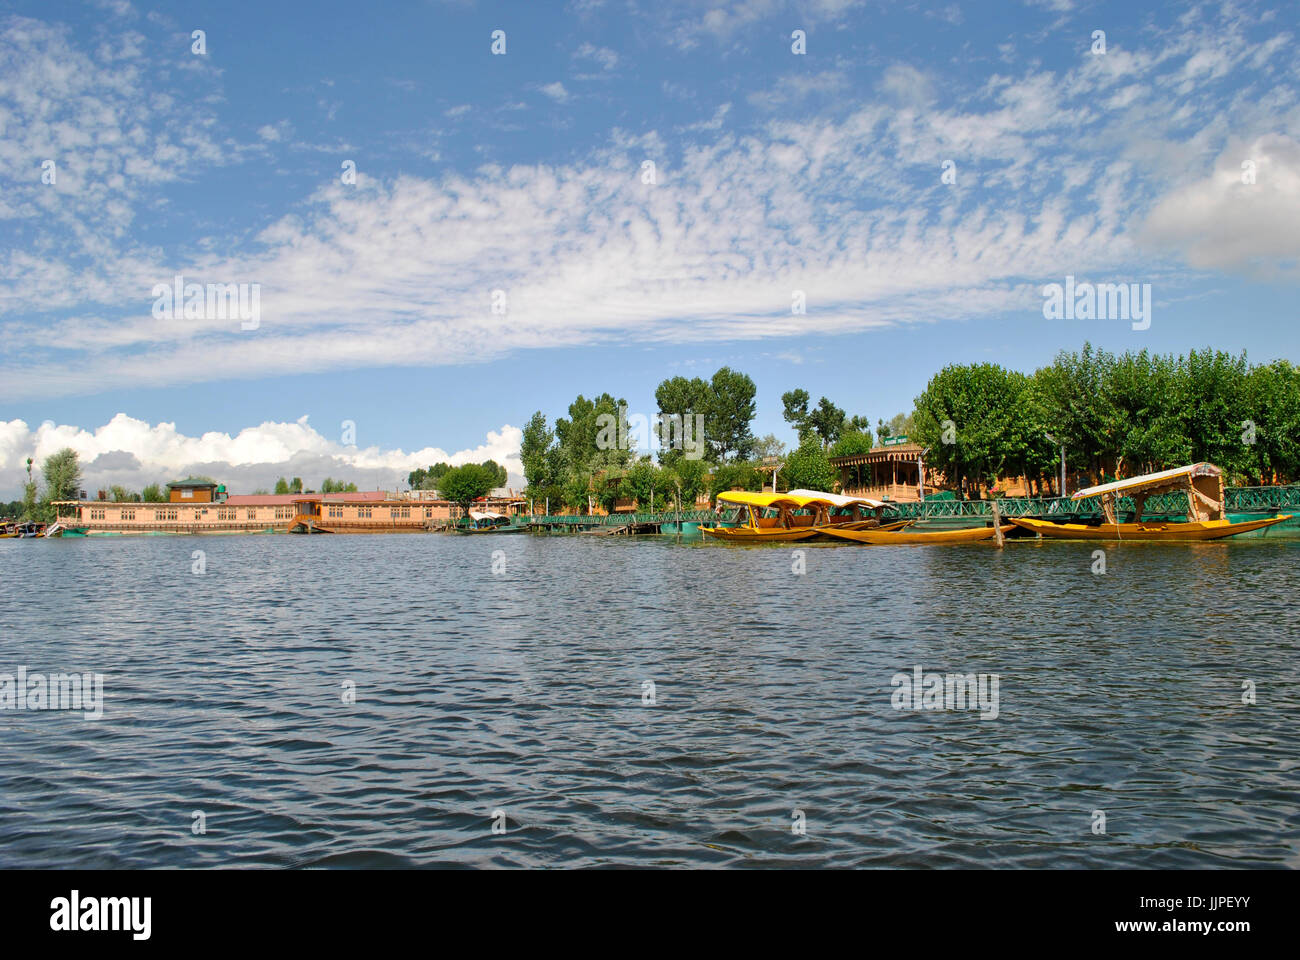 Dal Lake, Srinagar, Jammu and Kashmir, India Stock Photo